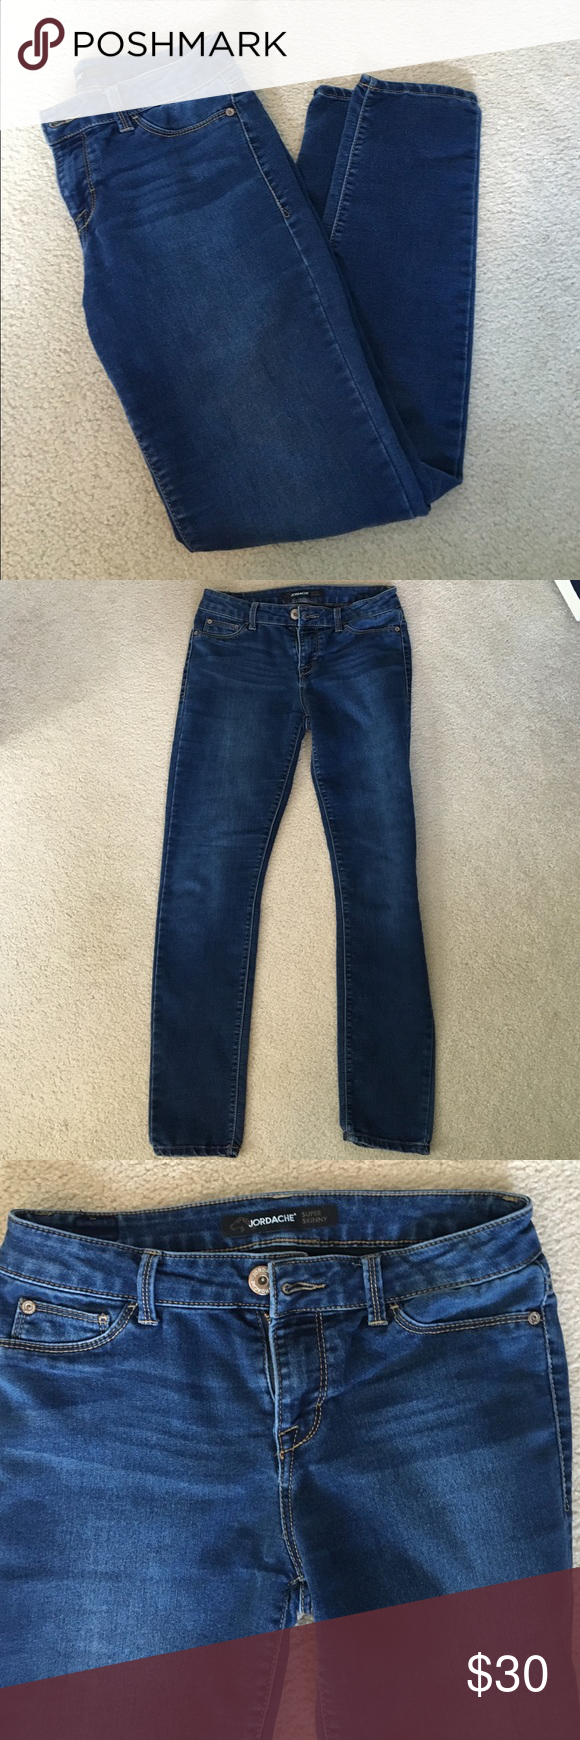 Jordache Super Skinny Jeans Excellent condition. These are so soft. Jordache supper skinny jeans. Jordache Jeans Skinny